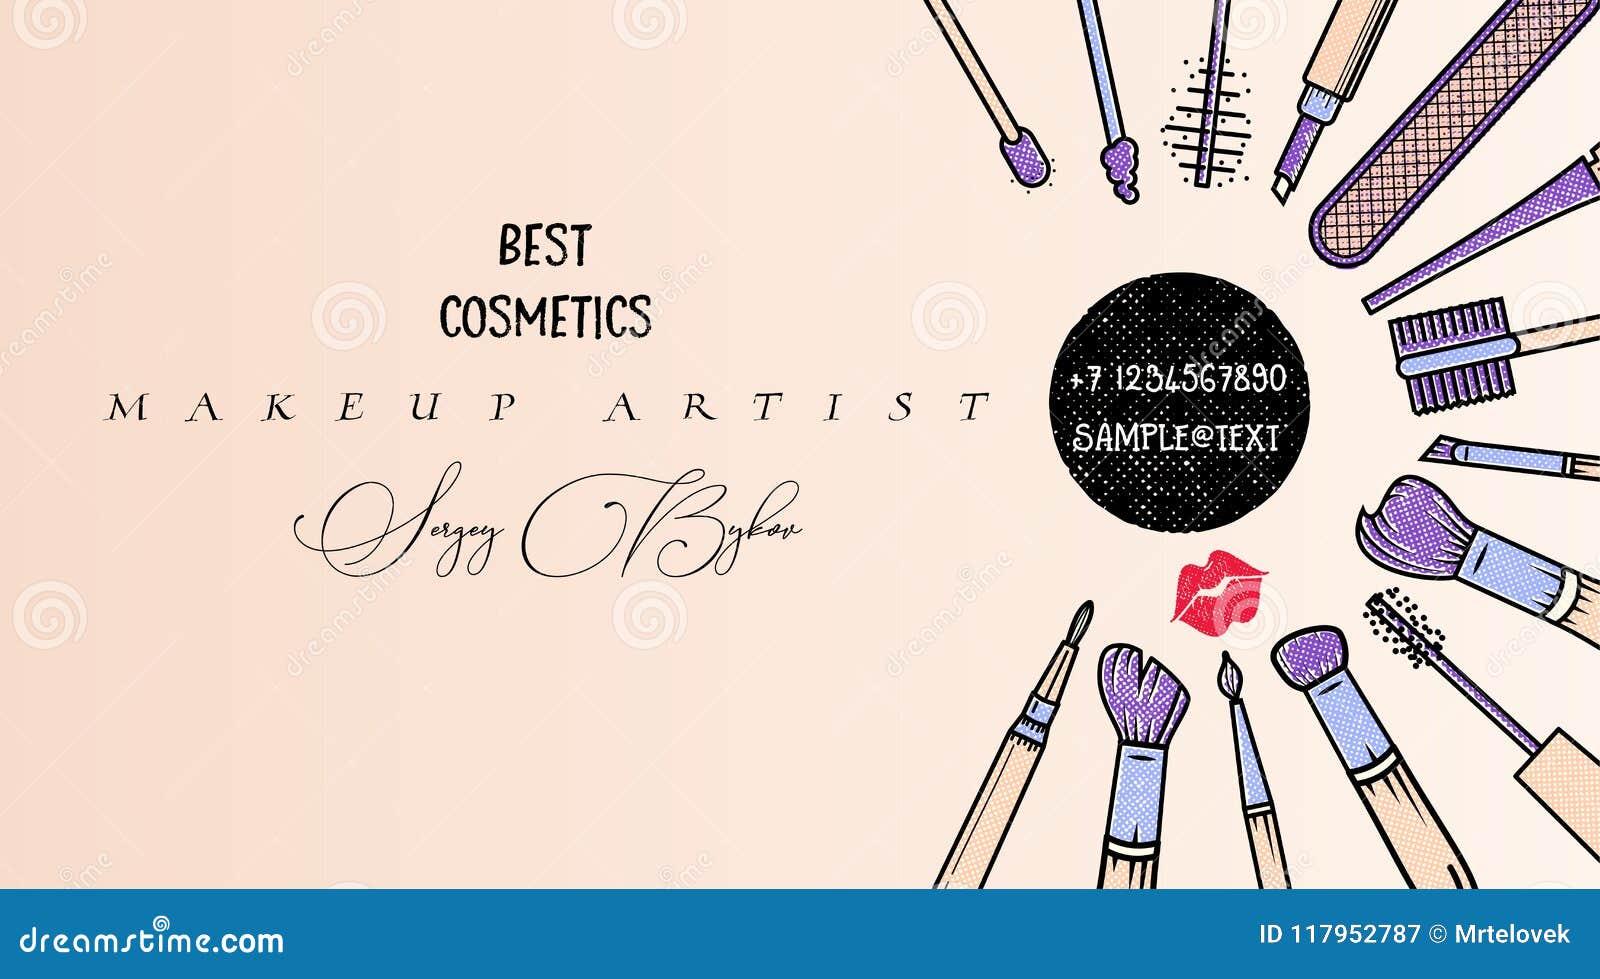 Makeup Artist Banner Beauty Salon Fashion Trends Background Business Concept Stock Vector Illustration Of Design Glamour 117952787